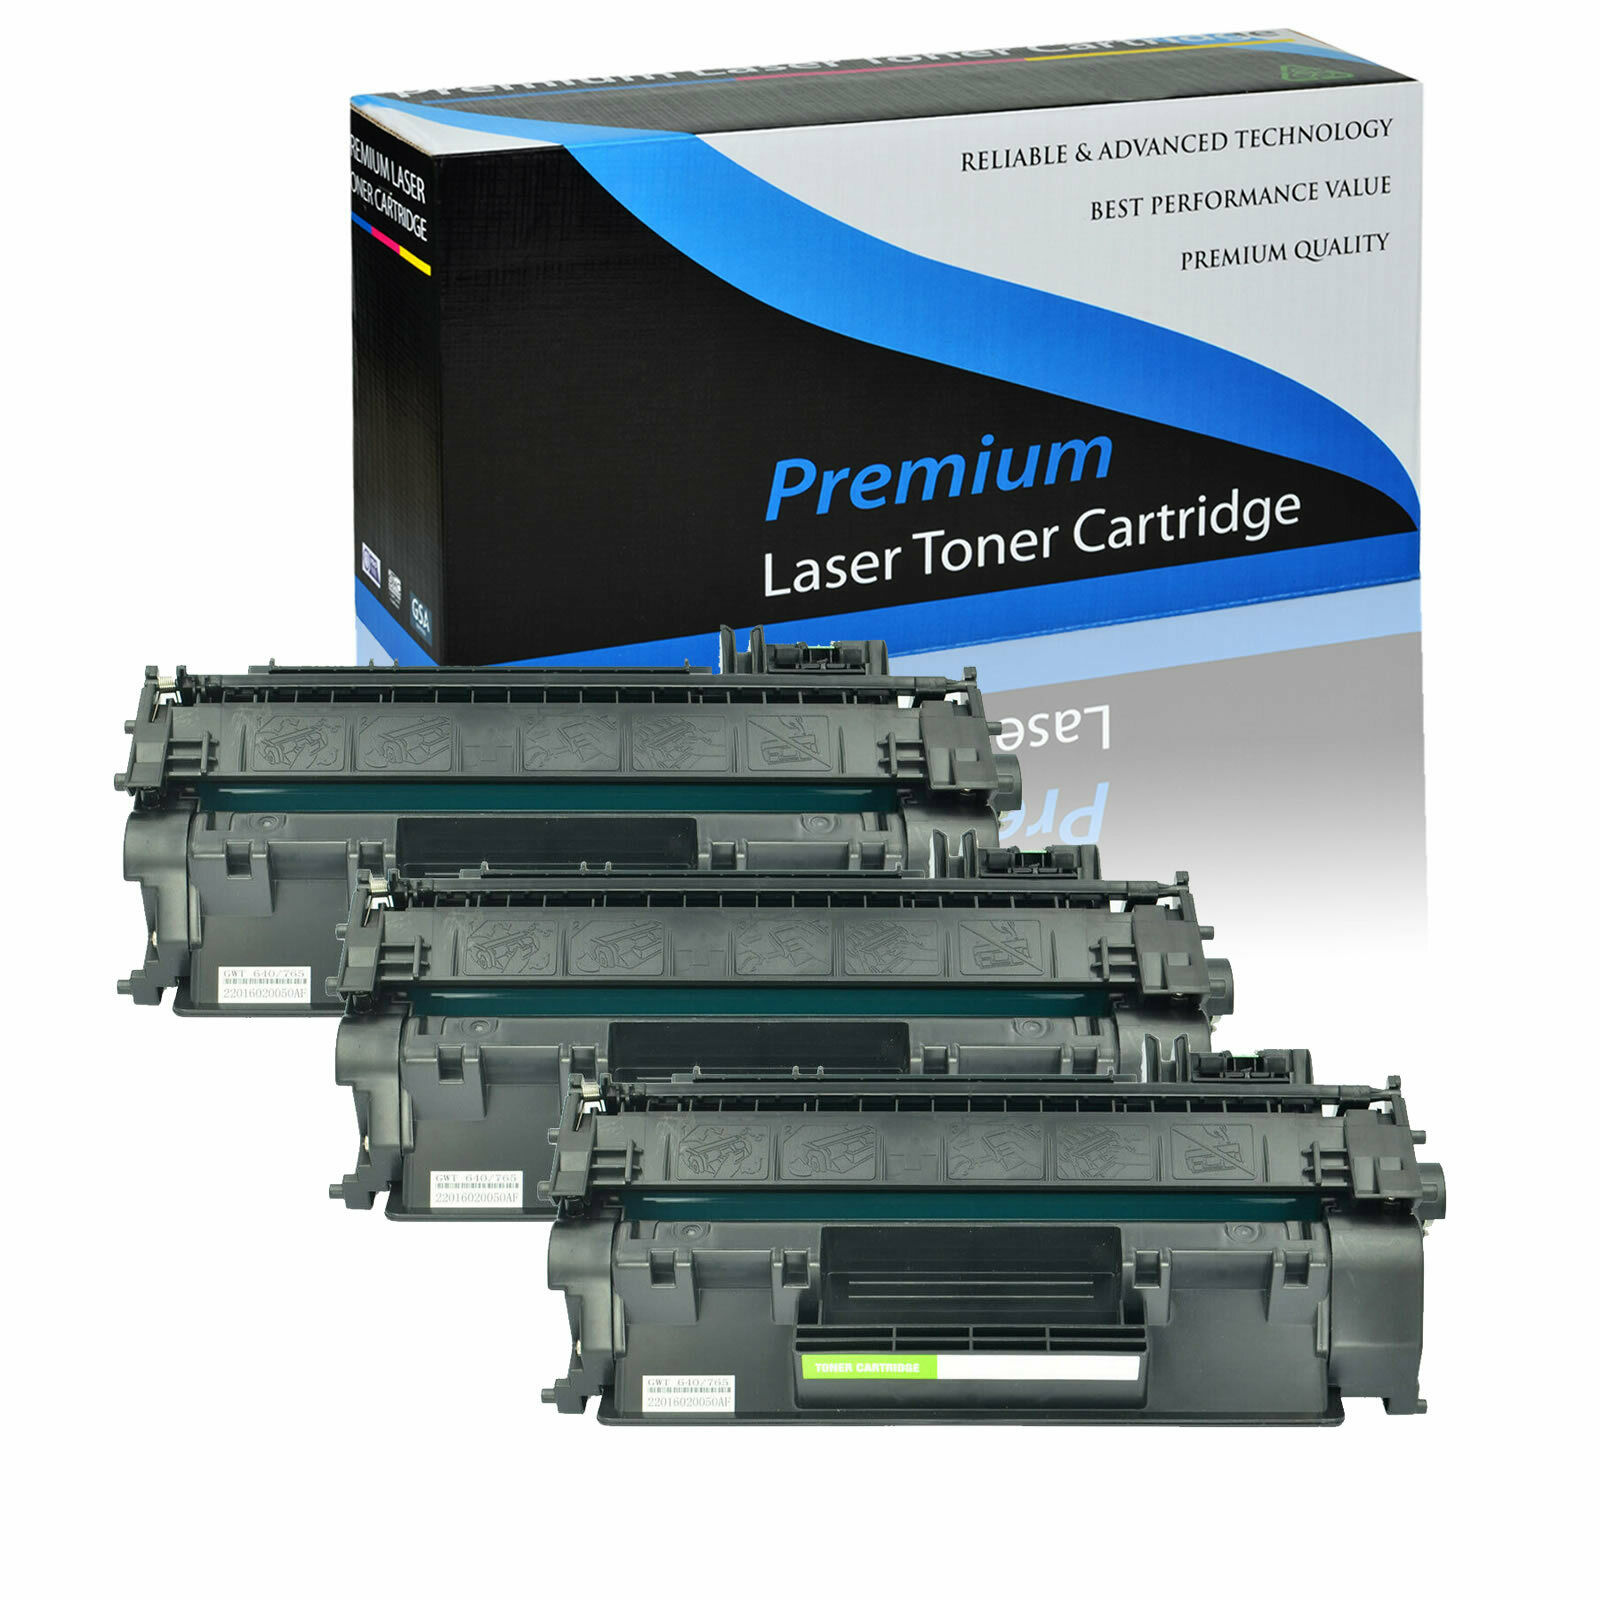 8 Pack High Yield CF280X 80X Toner For HP LaserJet Pro 400 M401dn M401dw M425dw